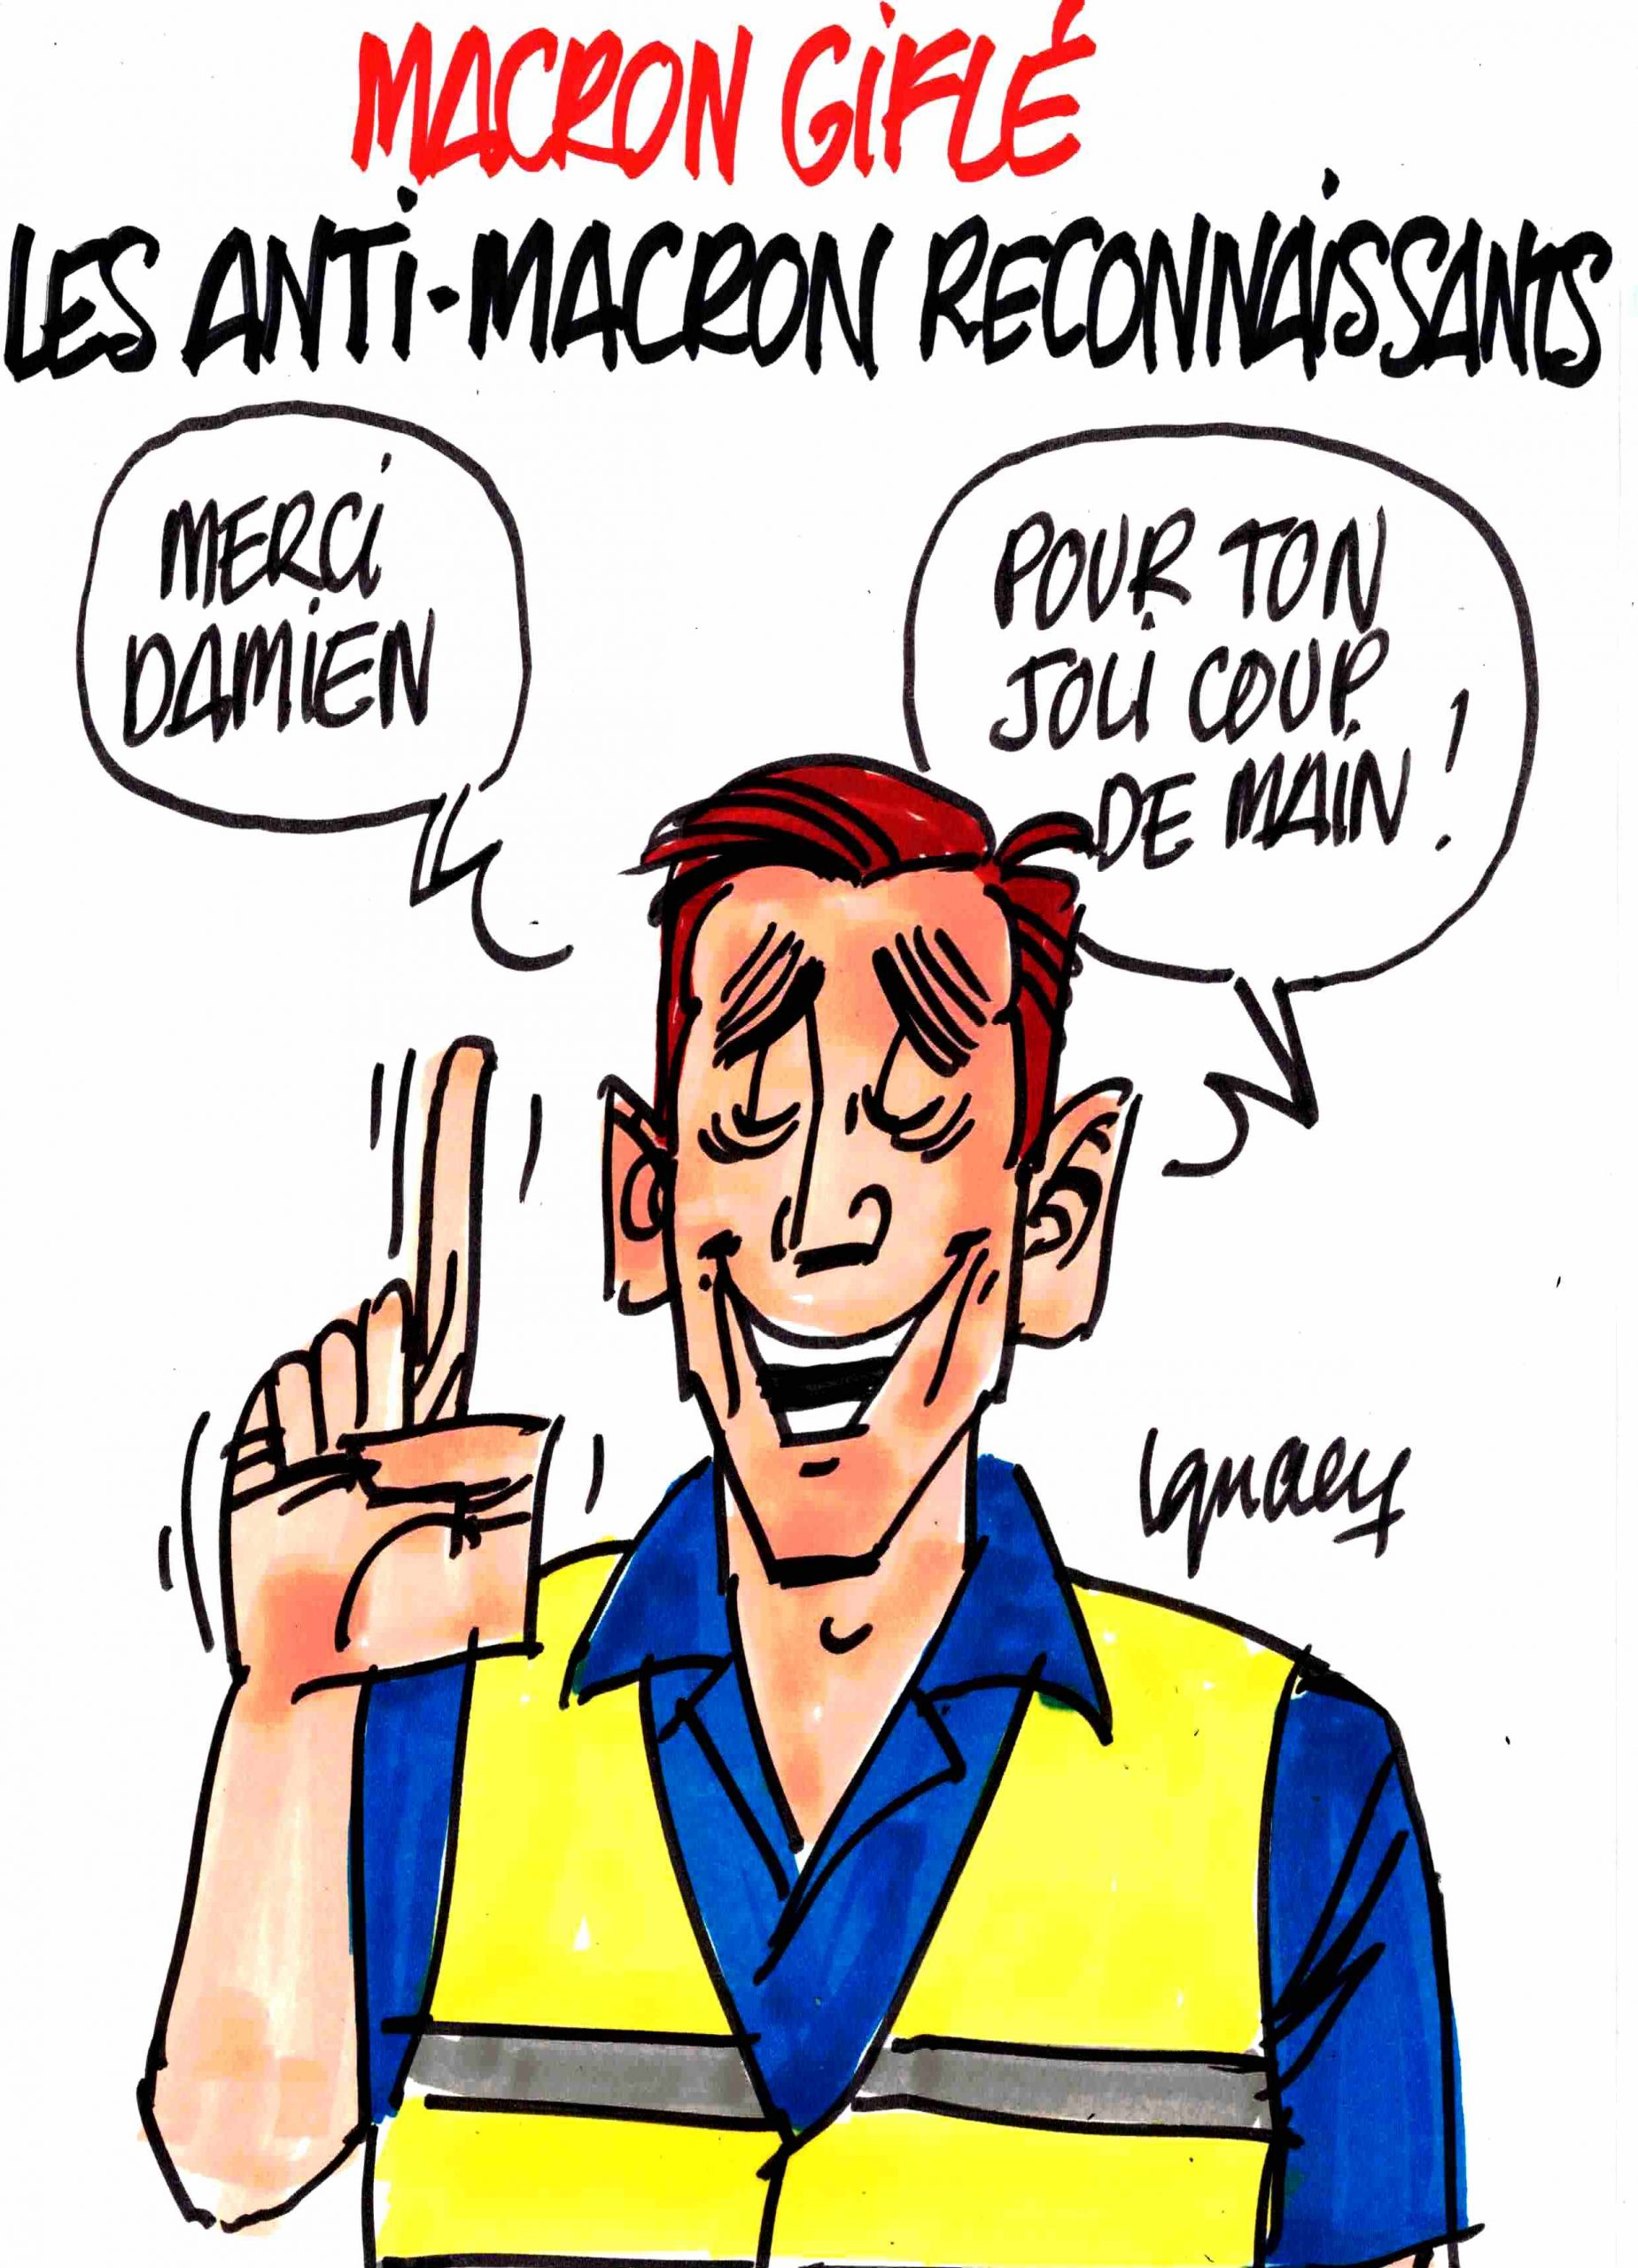 Ignace - Macron giflé